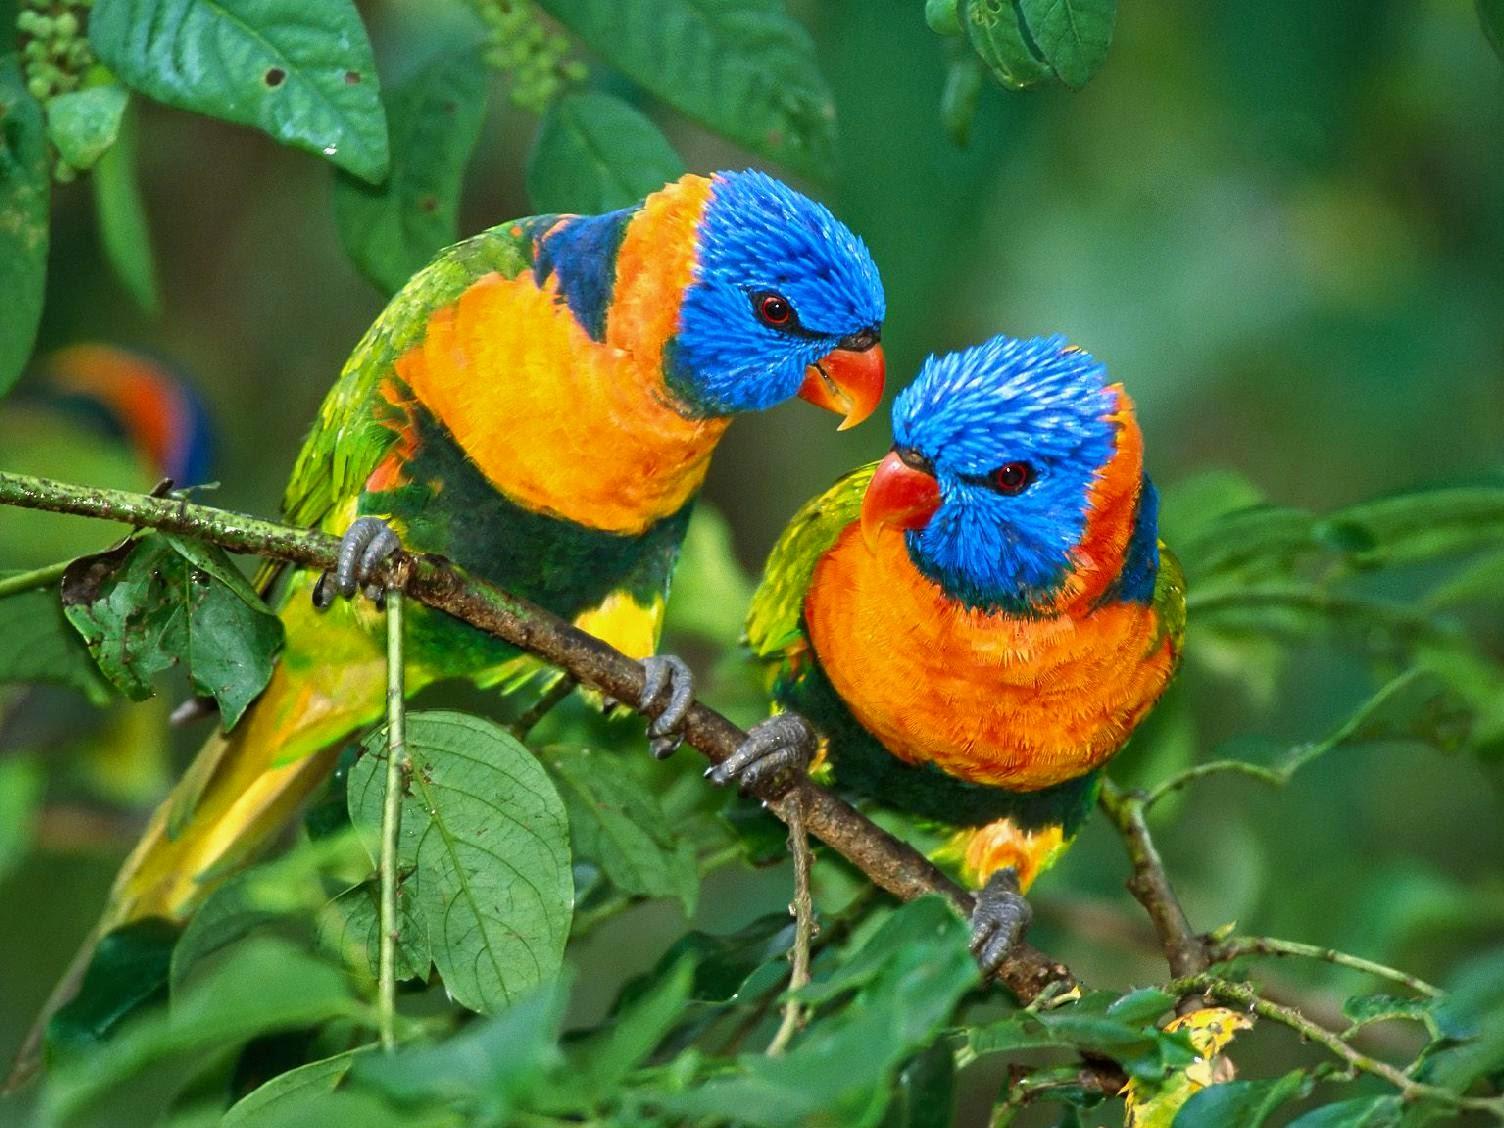 Burung Kicau Wallpaper HD